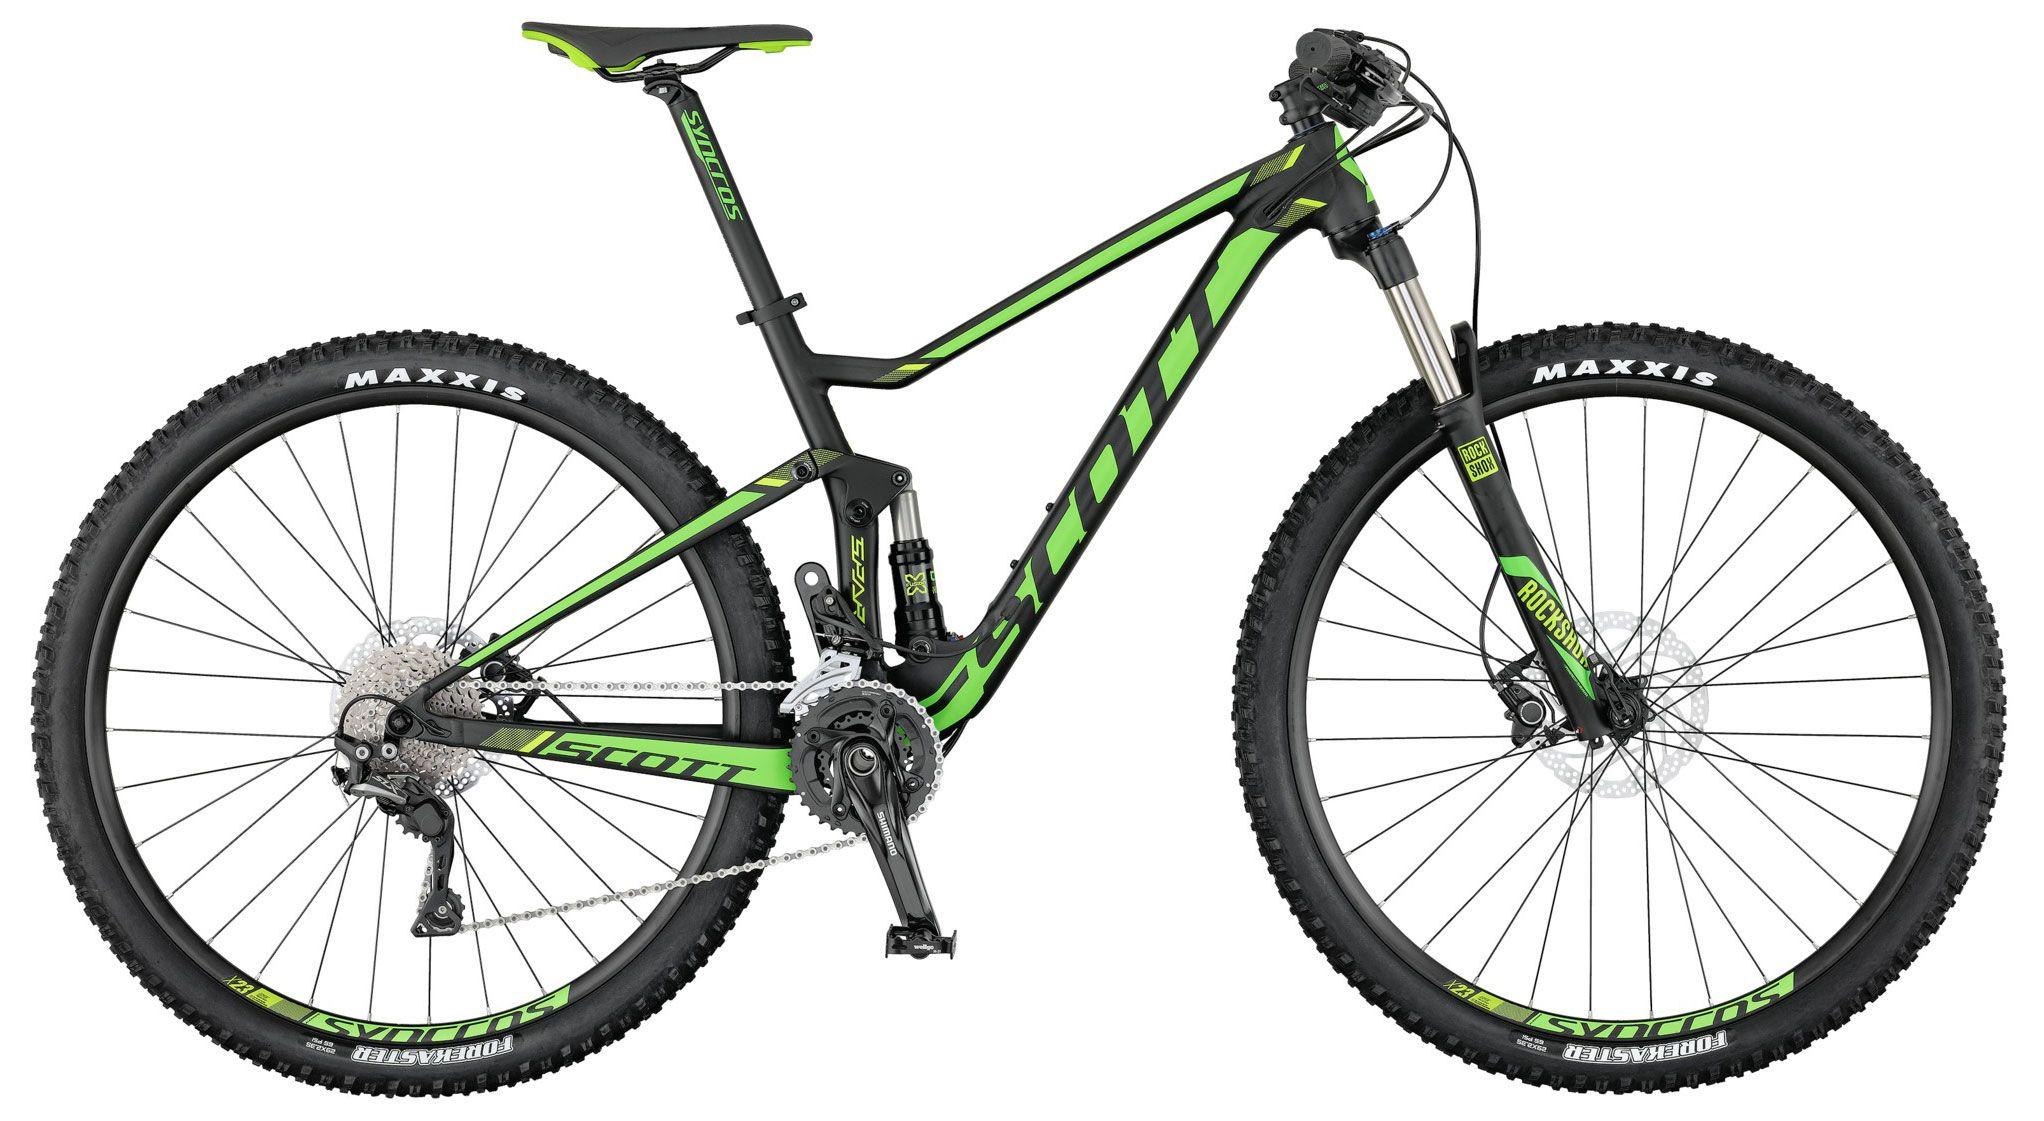 Велосипед Scott Spark 760 2017,  Двухподвесы  - артикул:275876